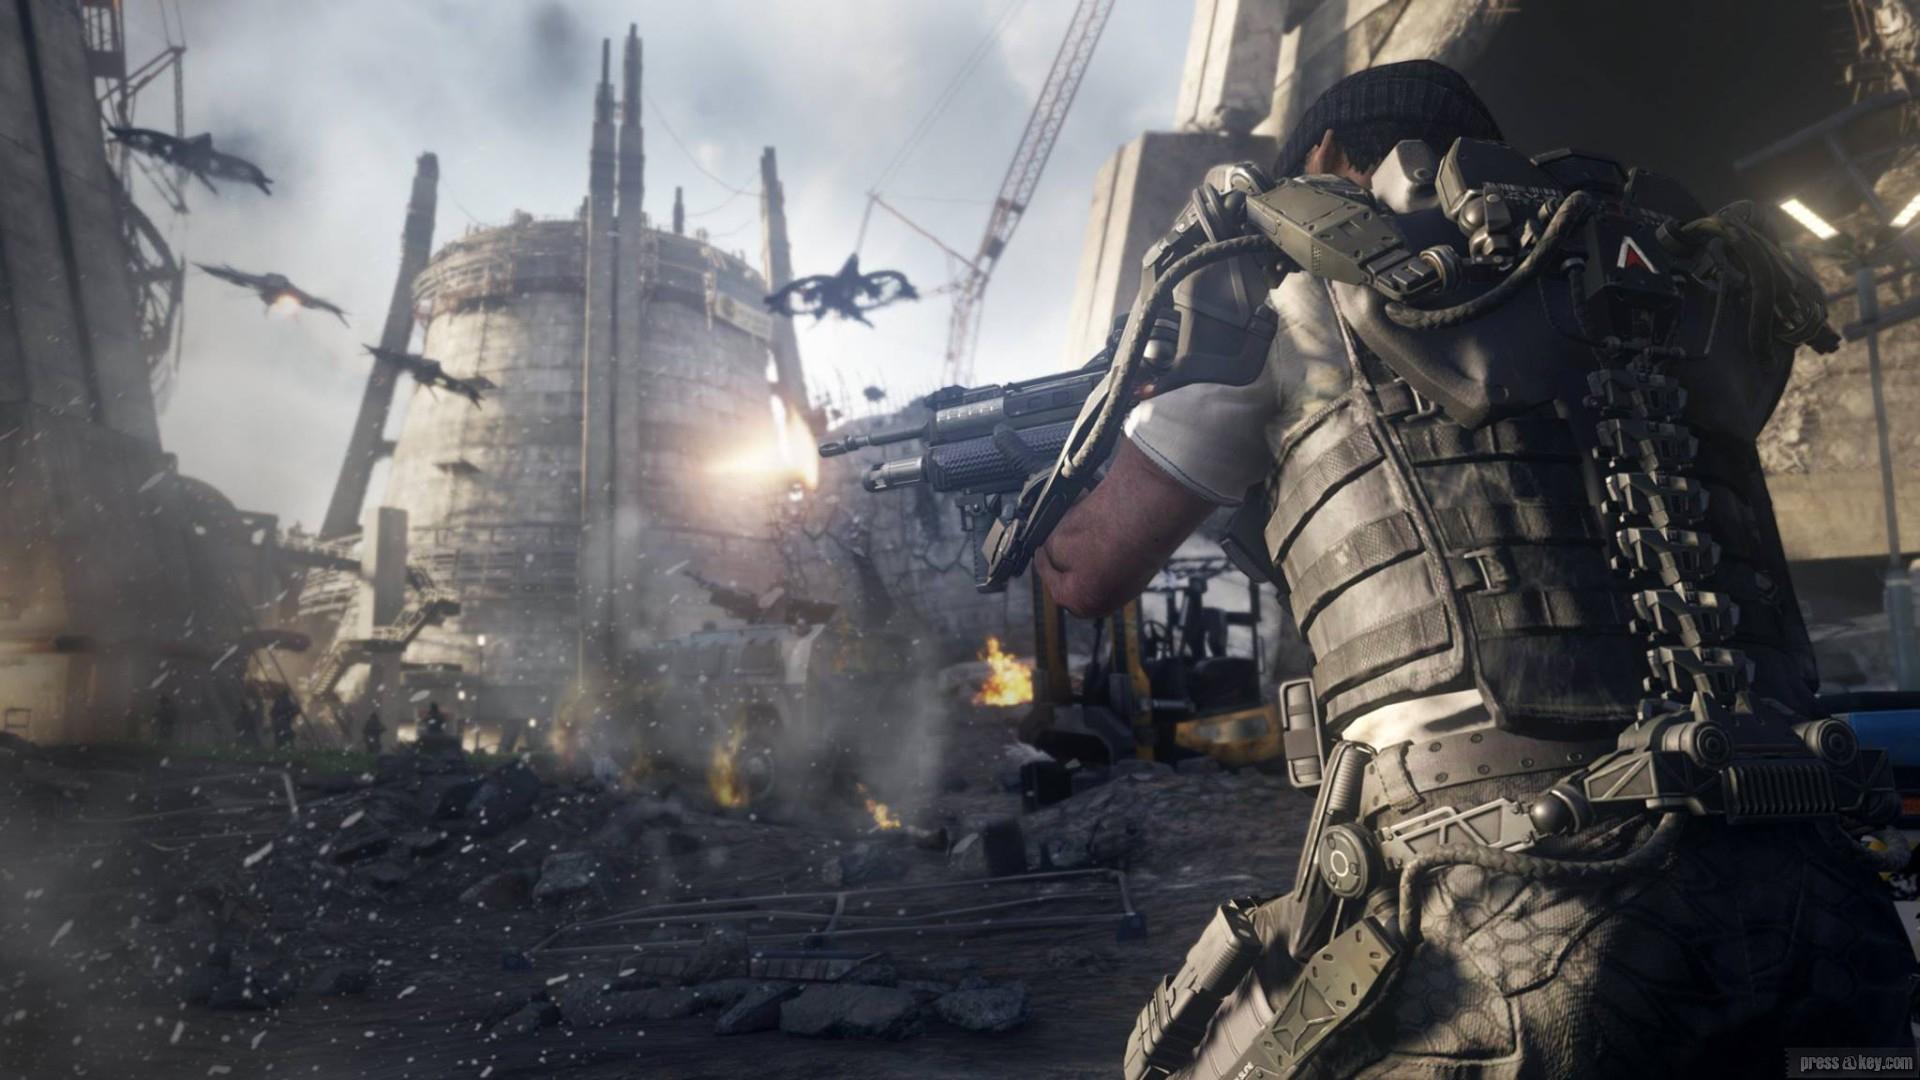 Call of Duty Advanced Warfare   Screenshot Galerie pressakeycom 1920x1080